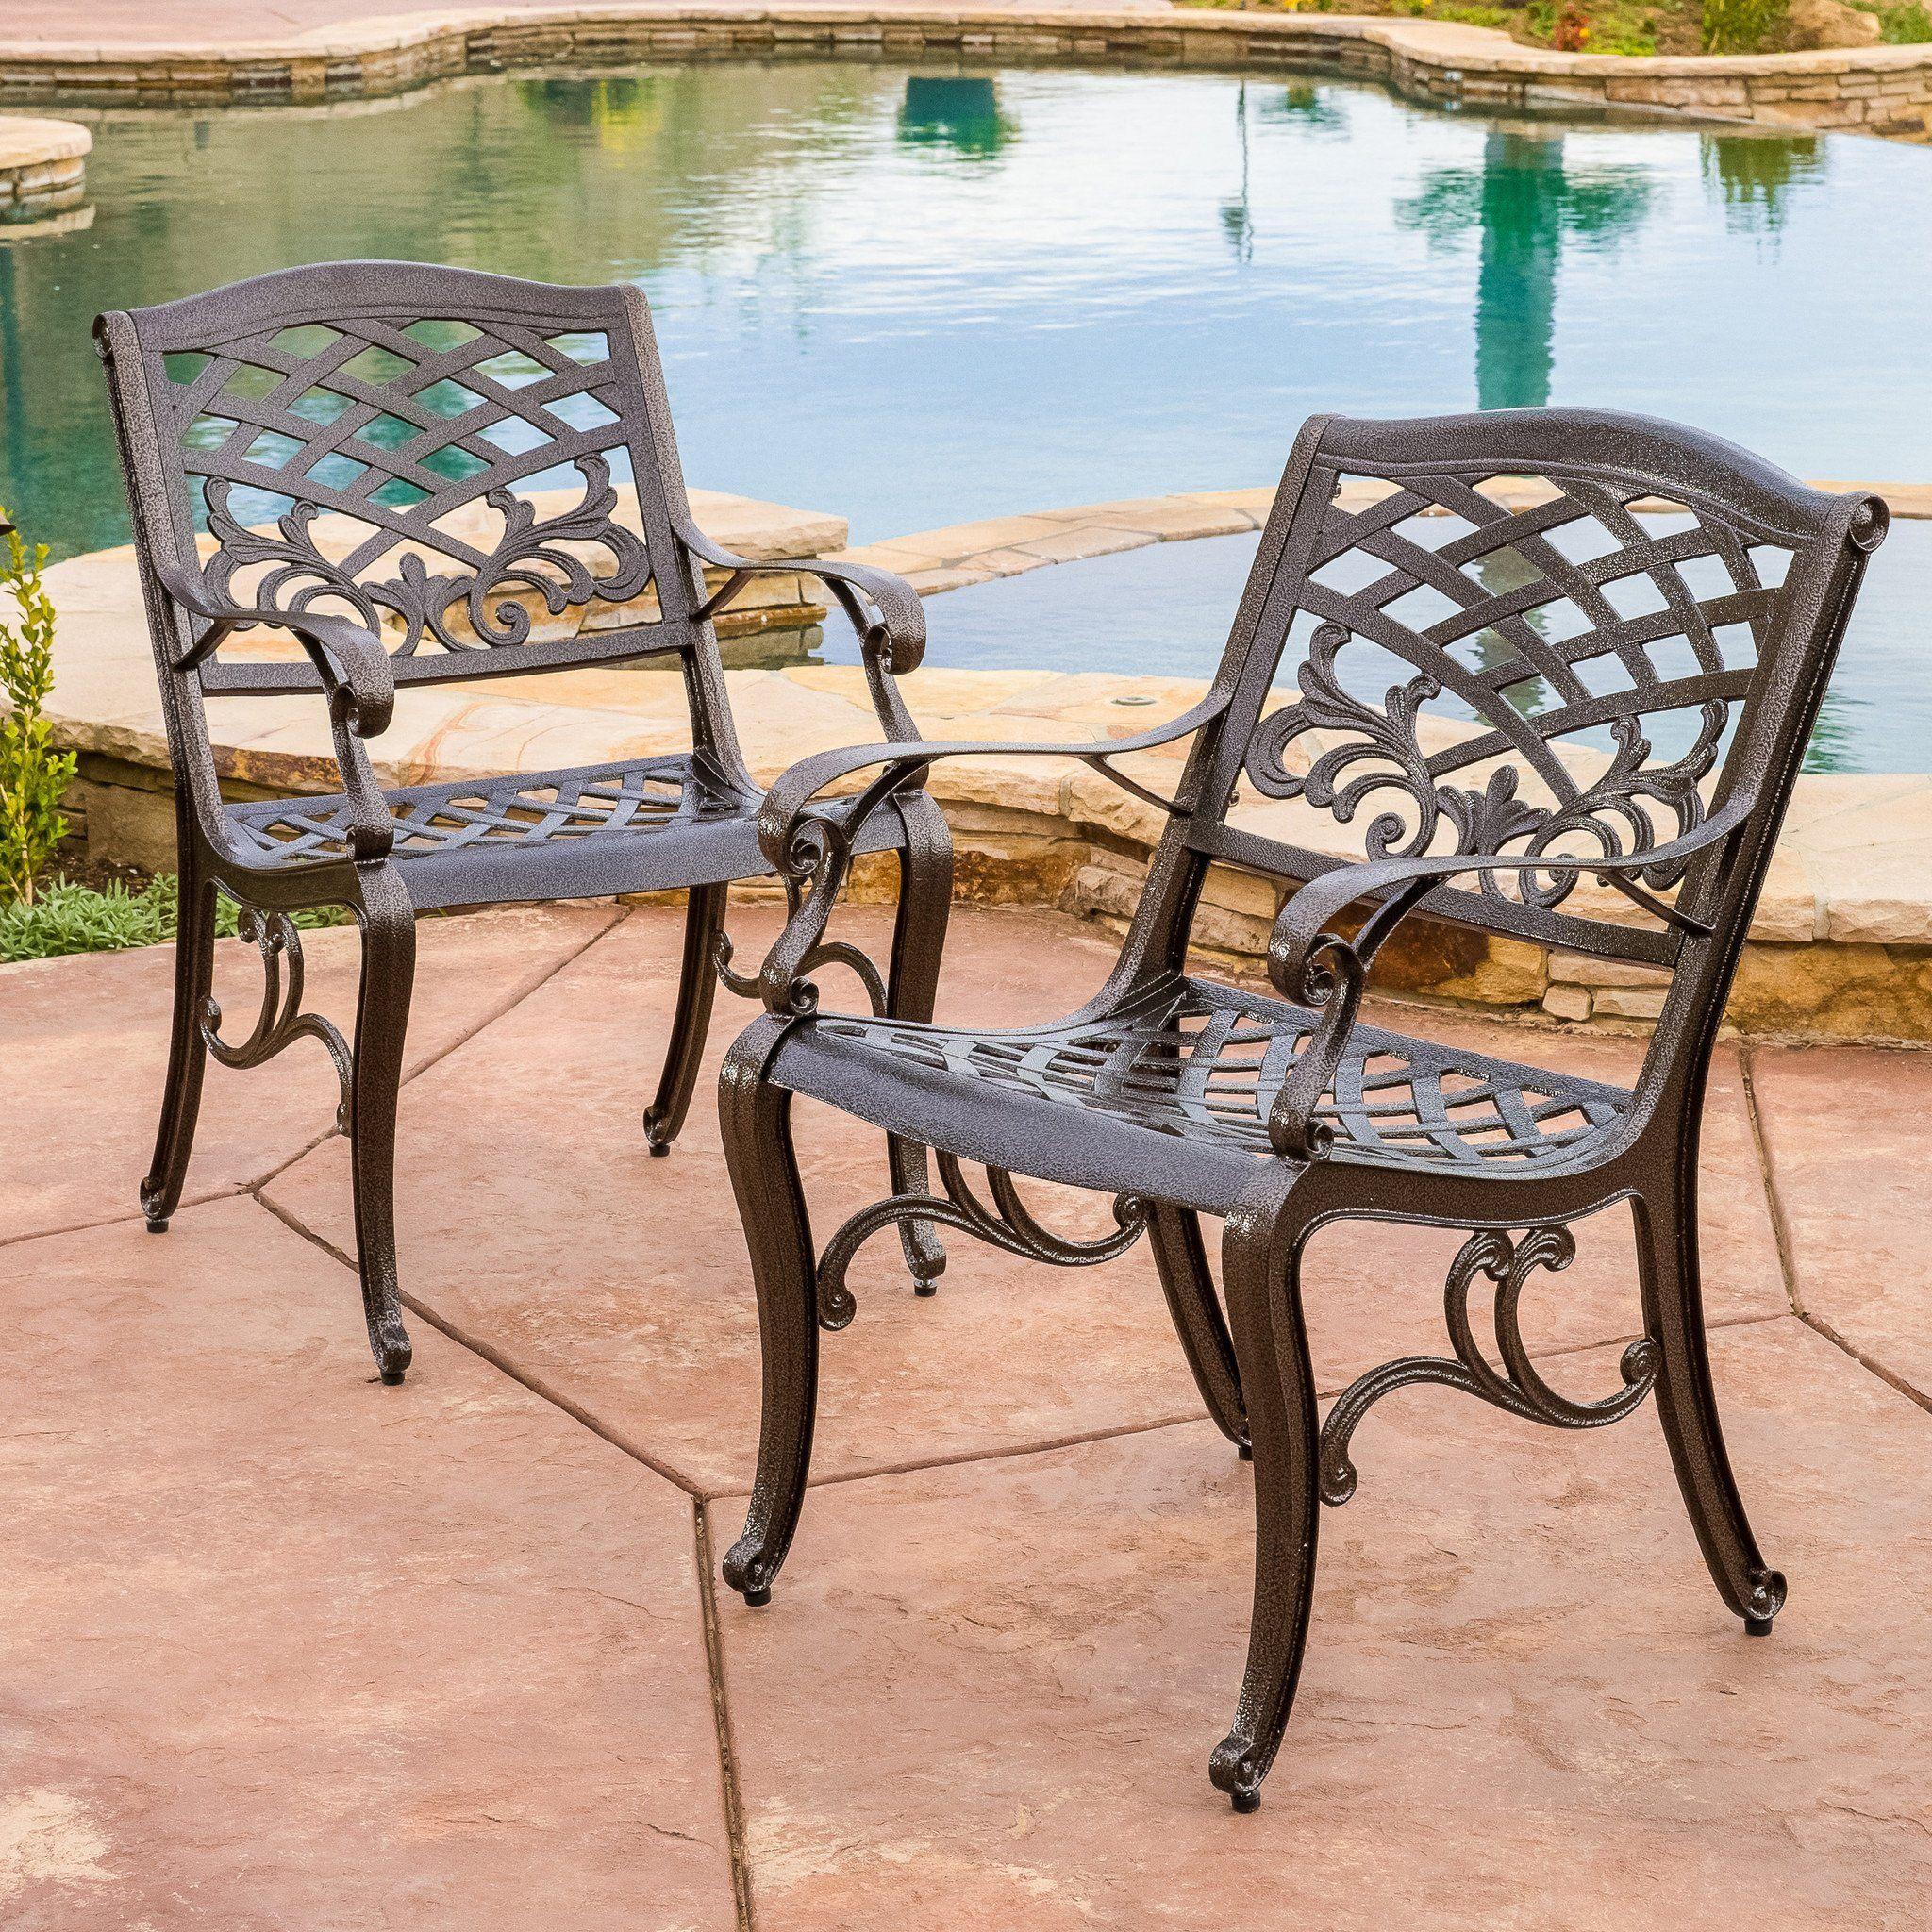 Covington Outdoor Cast Aluminum Dining Chair Set Of 2 Outdoor Chairs Cast Aluminum Patio Furniture Outdoor Chair Set